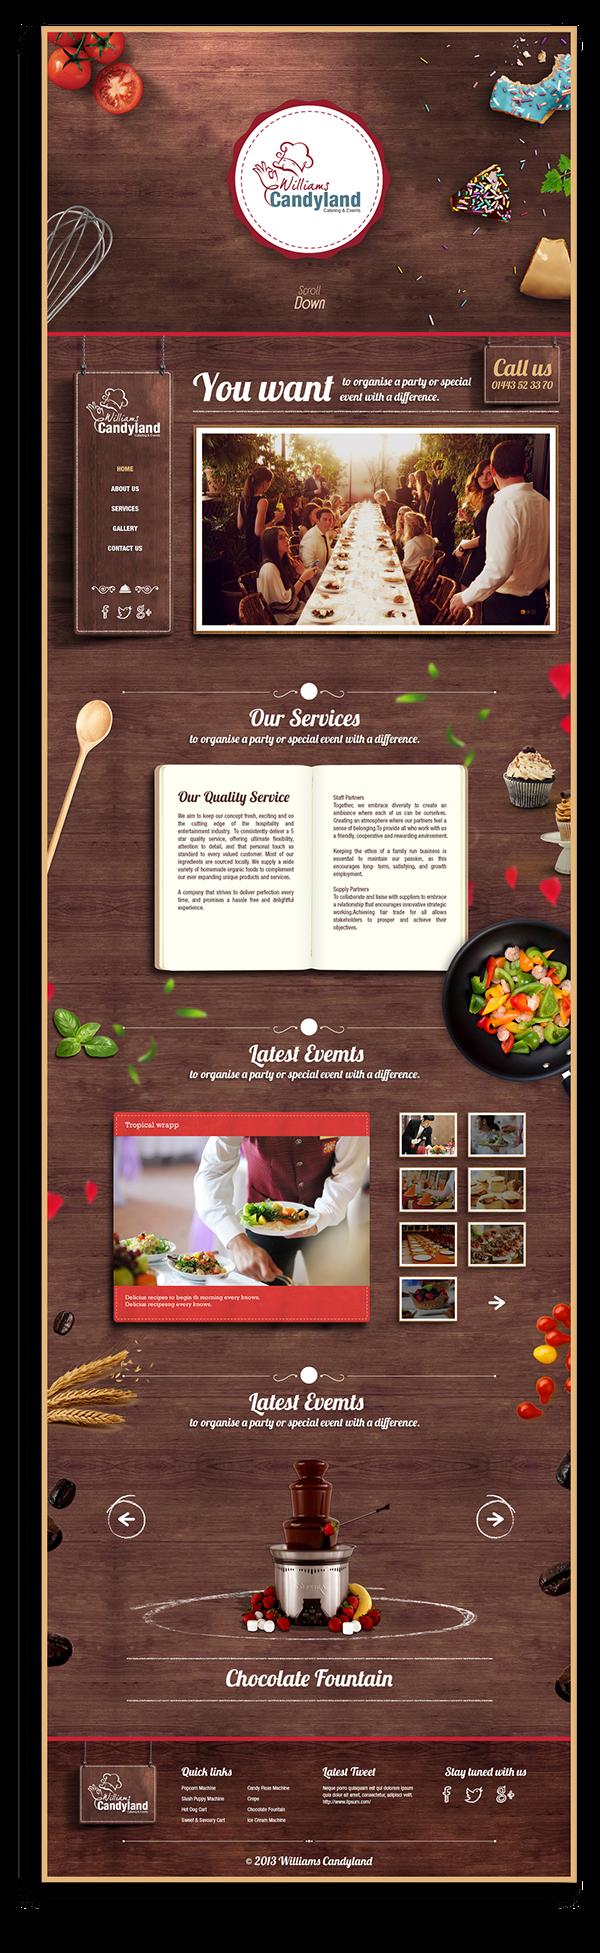 Cool Web Design, William's Candyland. #webdesign #webdevelopment [http://www.pinterest.com/alfredchong/]